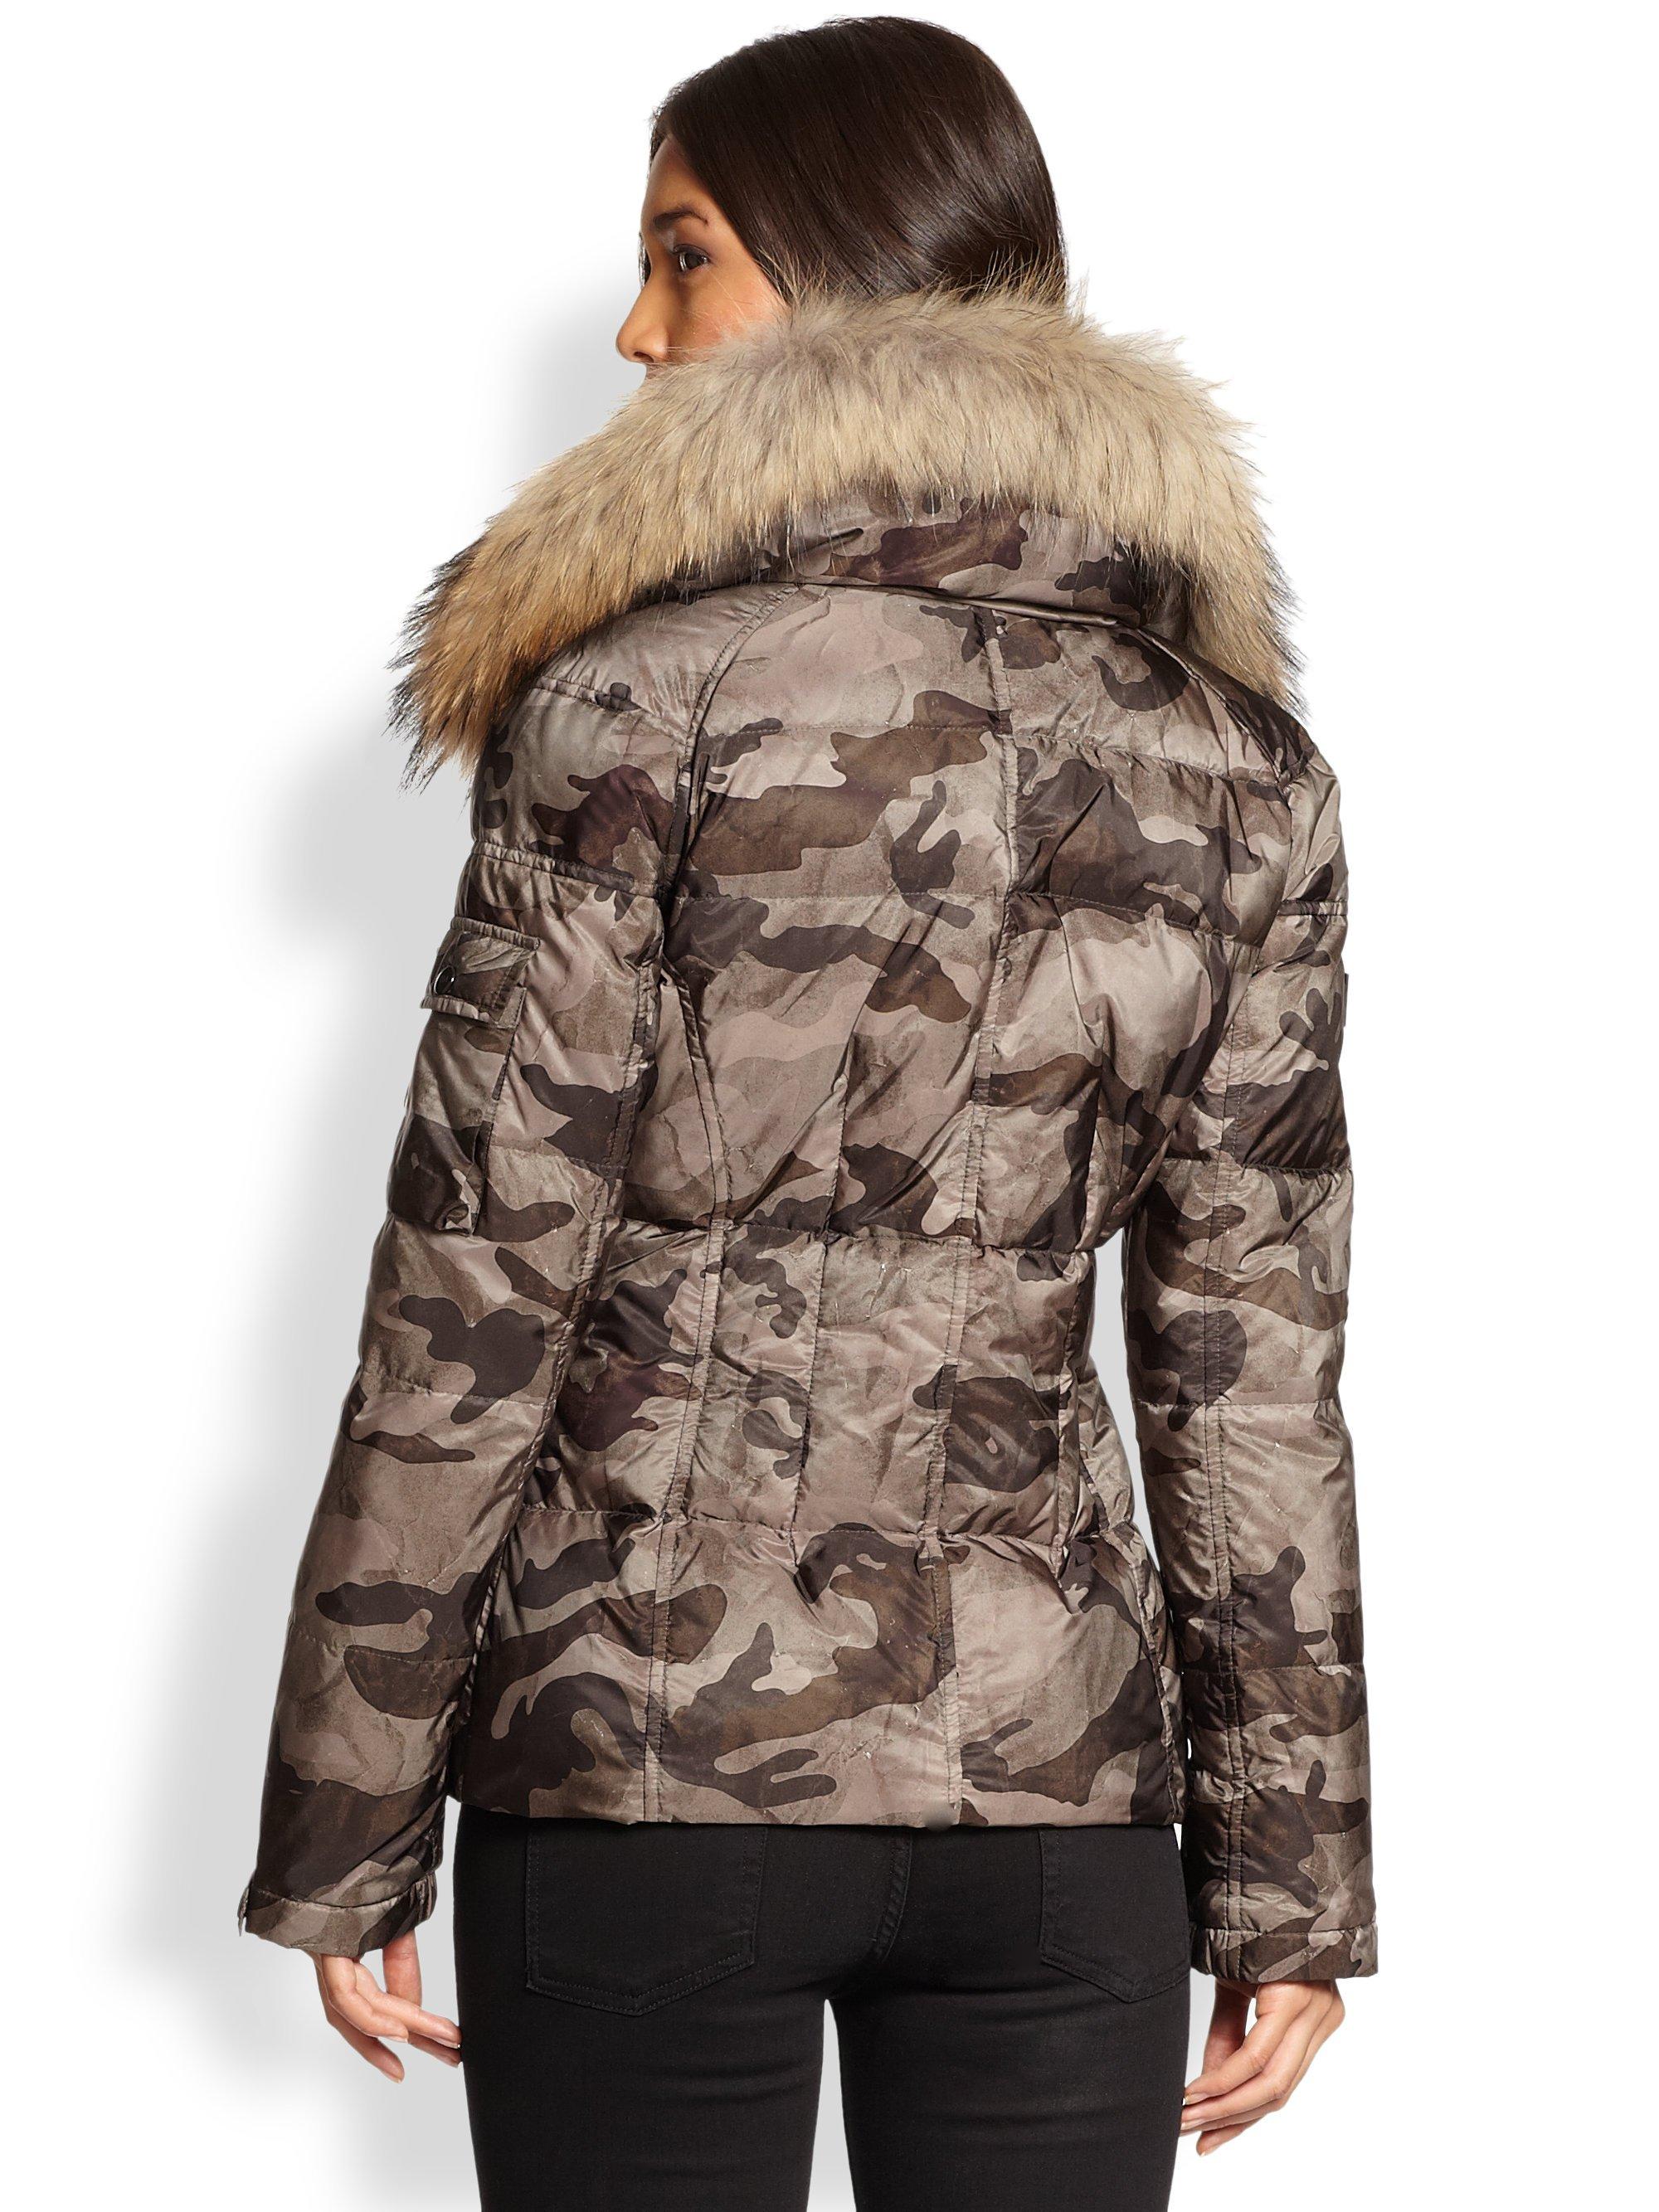 Camo Jacket Women